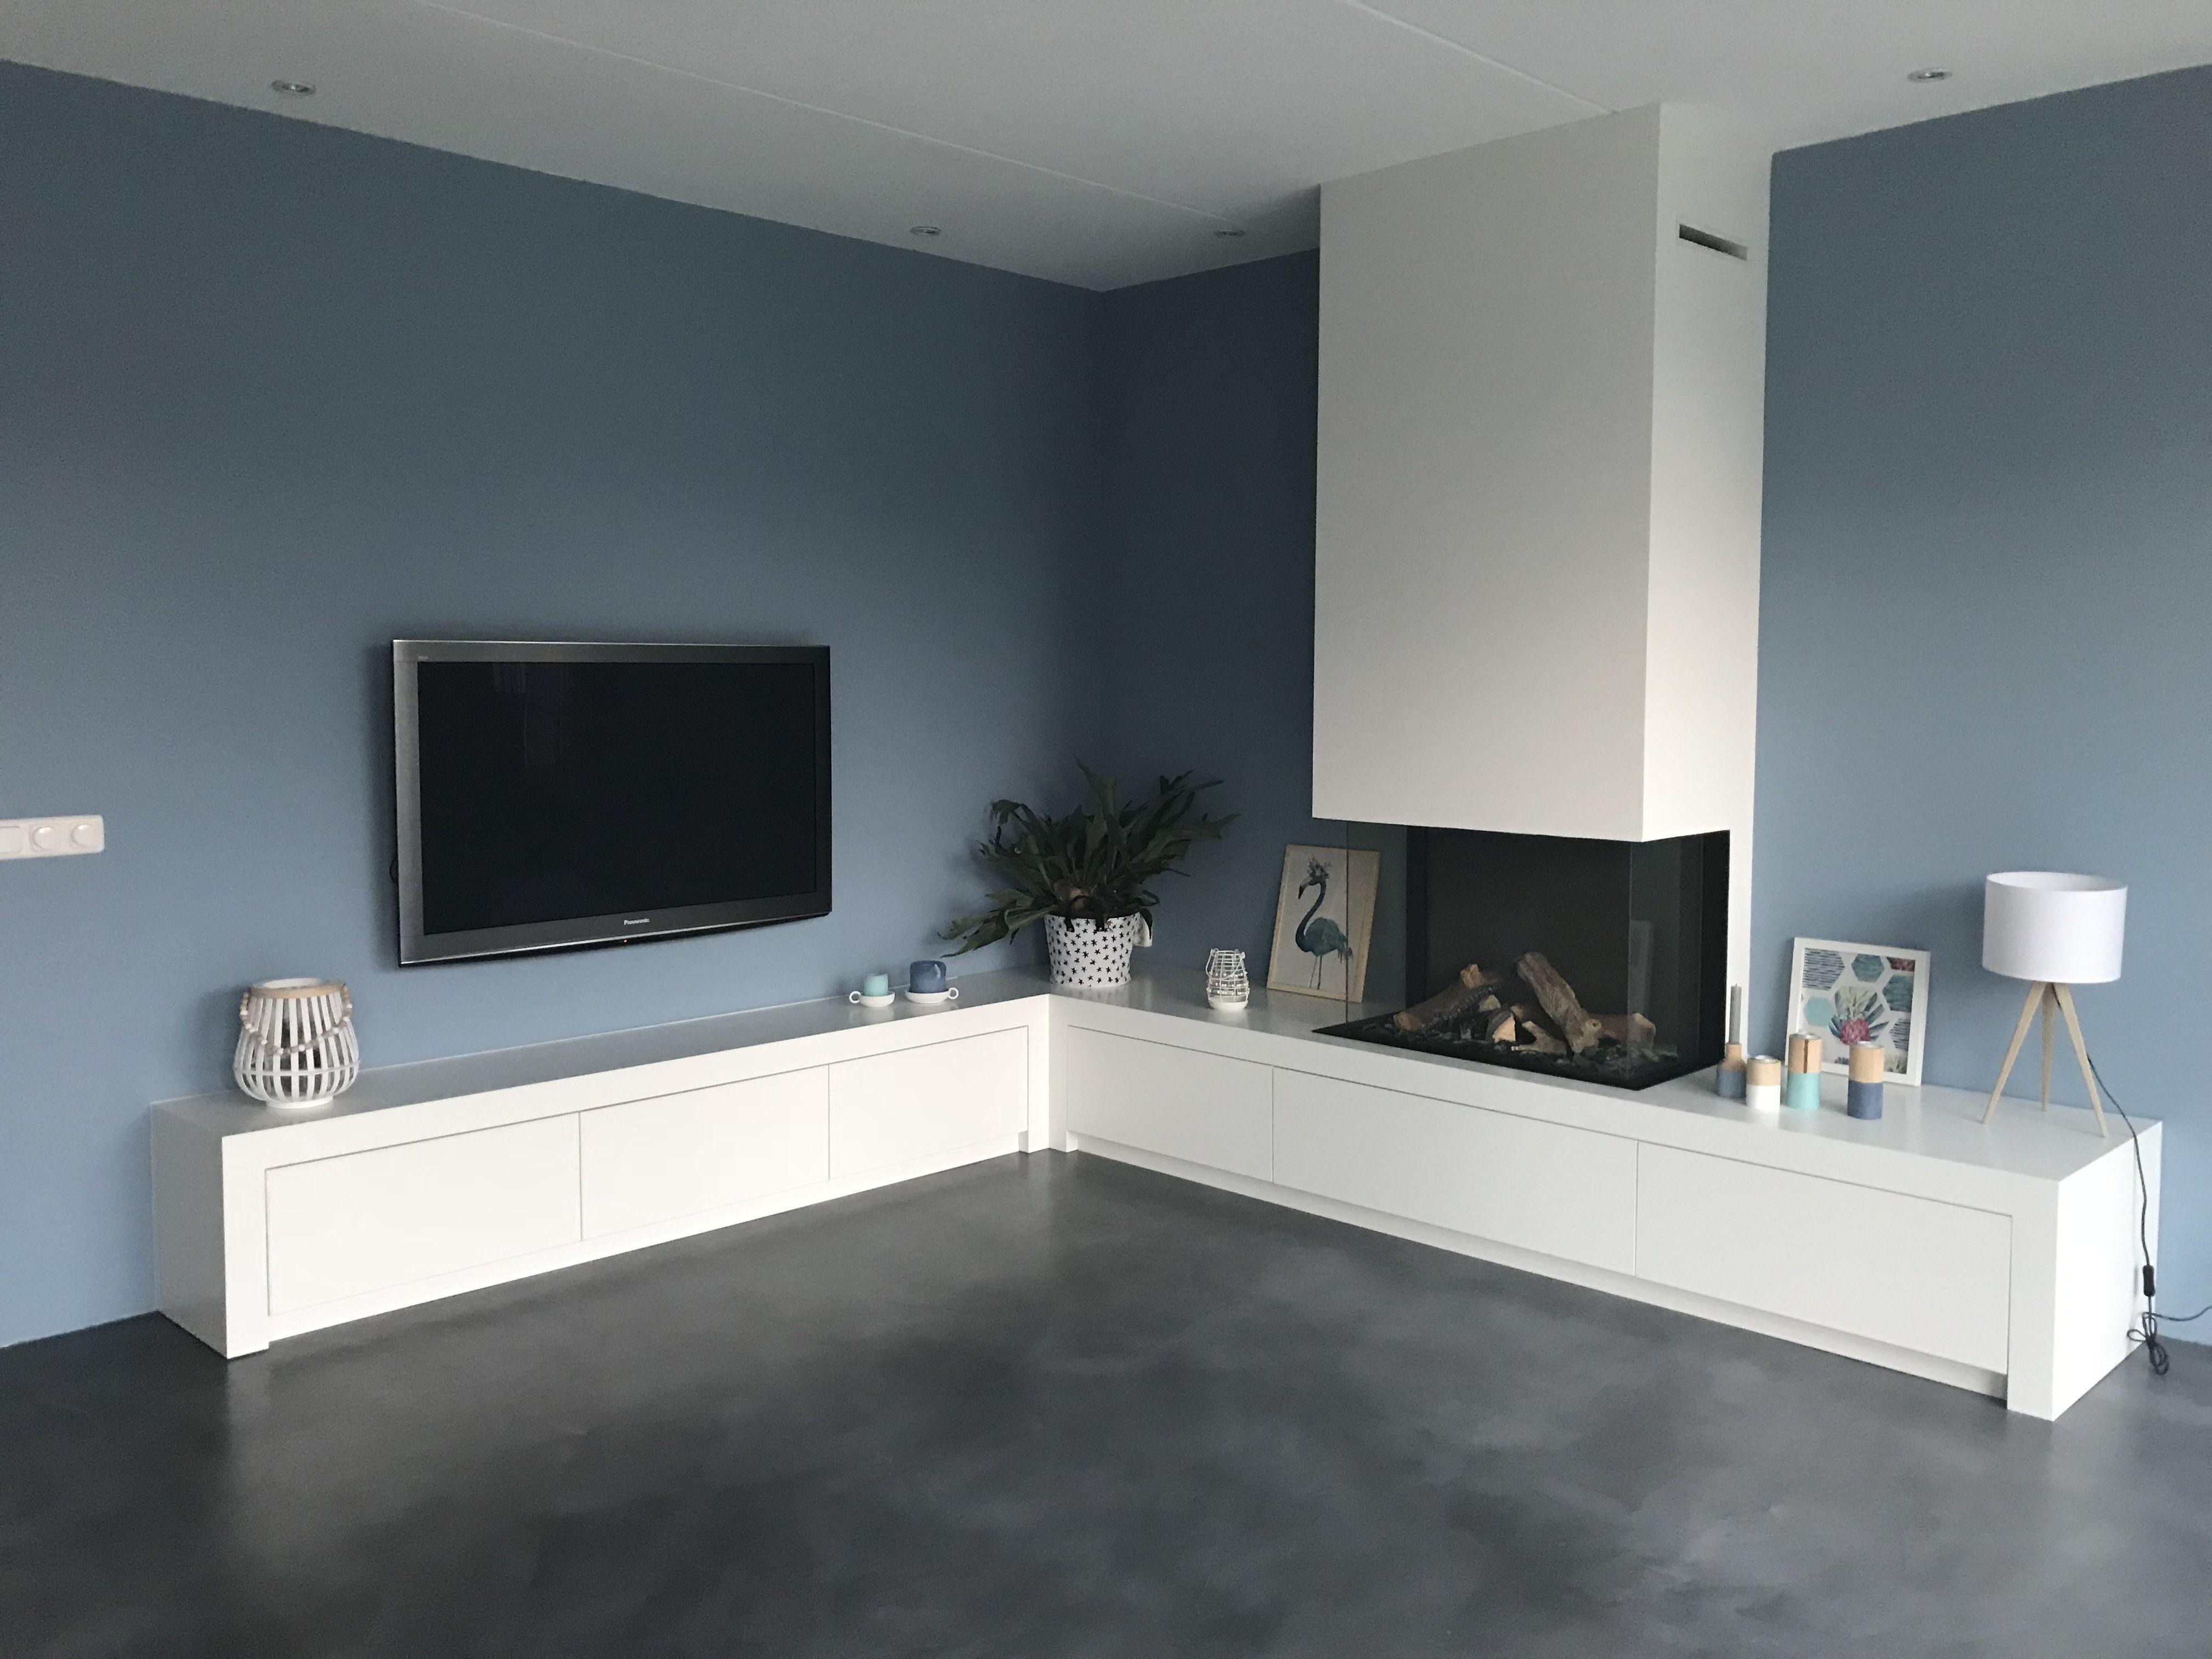 Woonkamer Tv Kast : Open haard tv meubel moderne open haard gashaard woonkamer tv hoek